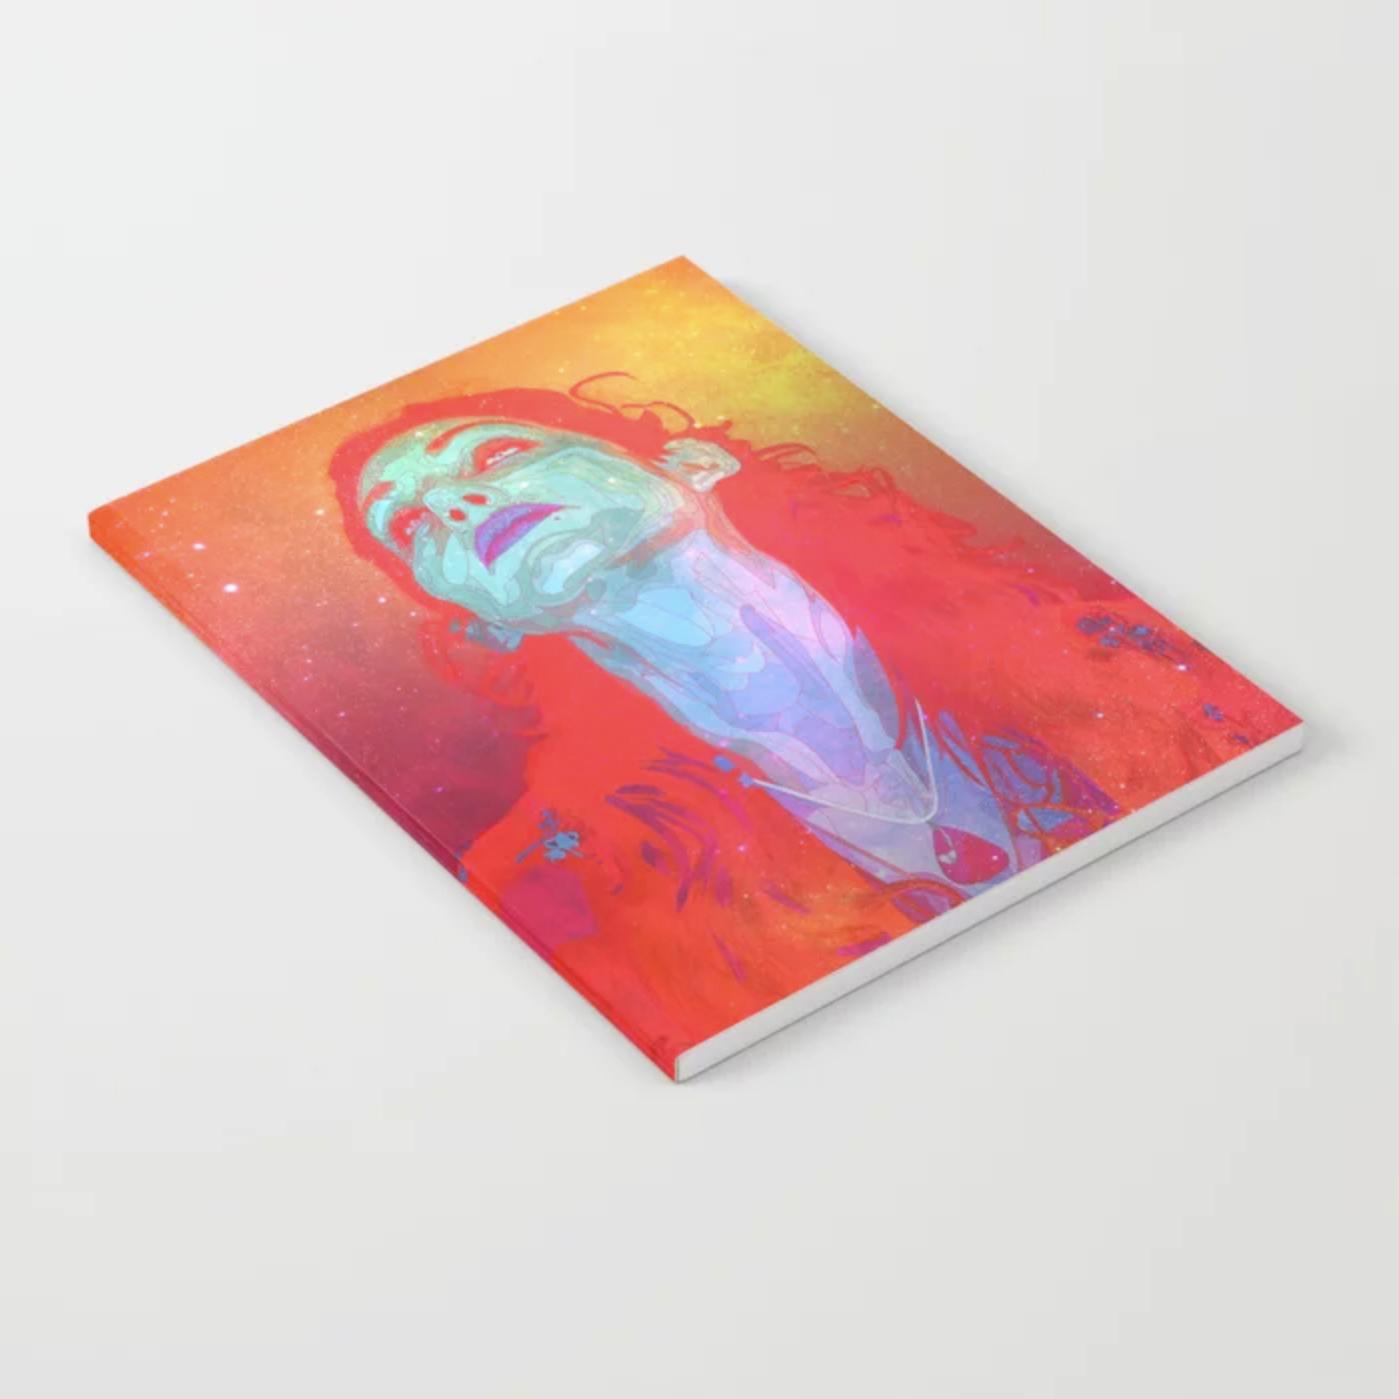 "Geena Matuson's (@geenamatuson) art ""Grow Galactic"" printed on demand in her online shop @ thegirlmirage.com."